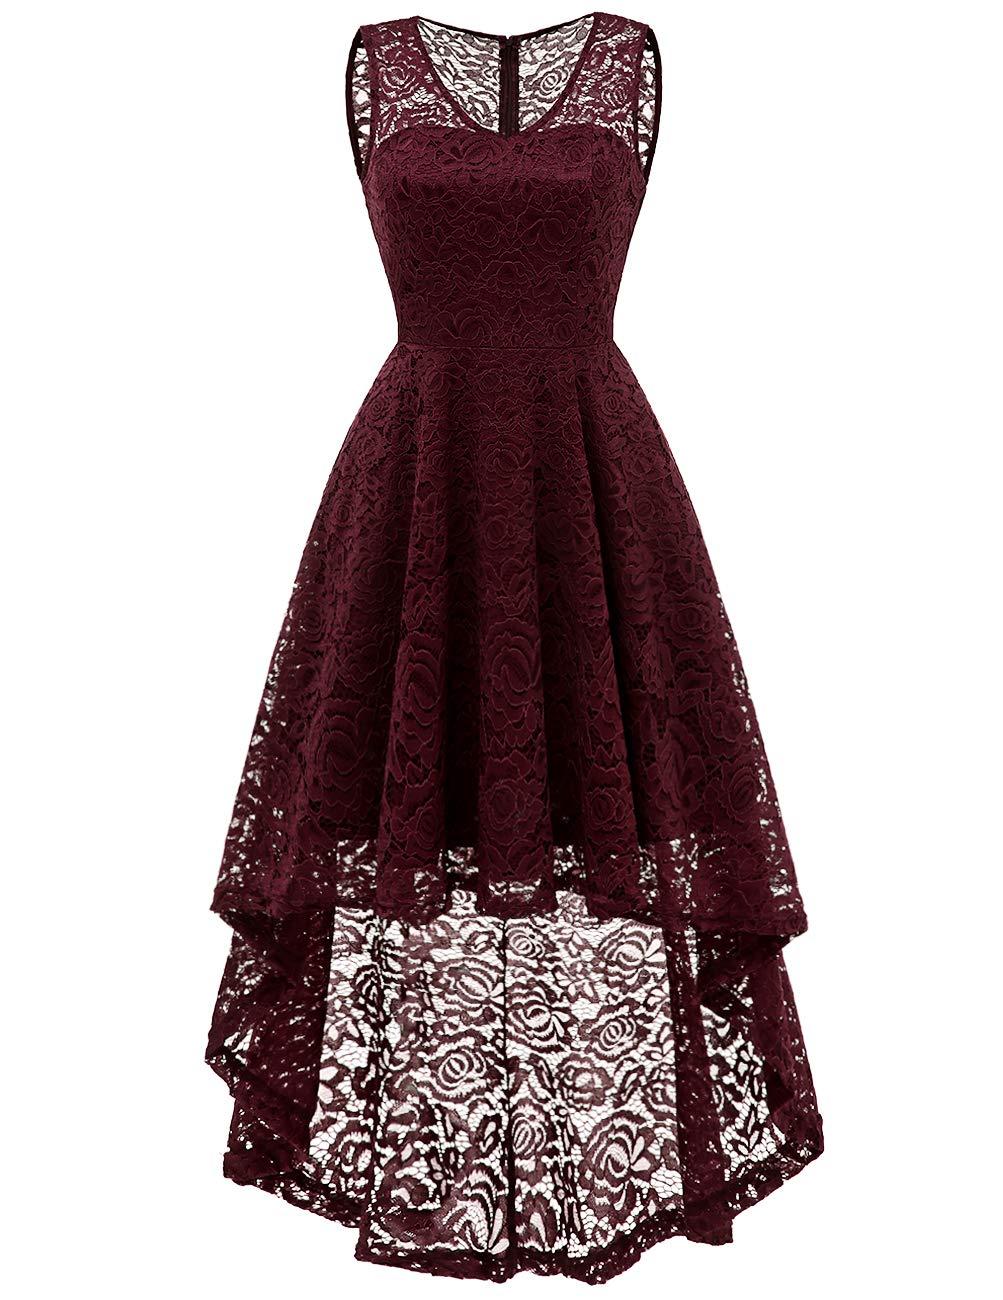 DRESSTELLS Women's Cocktail V-Neck Dress Floral Lace Hi-Lo Formal Swing Party Dress Burgundy XL